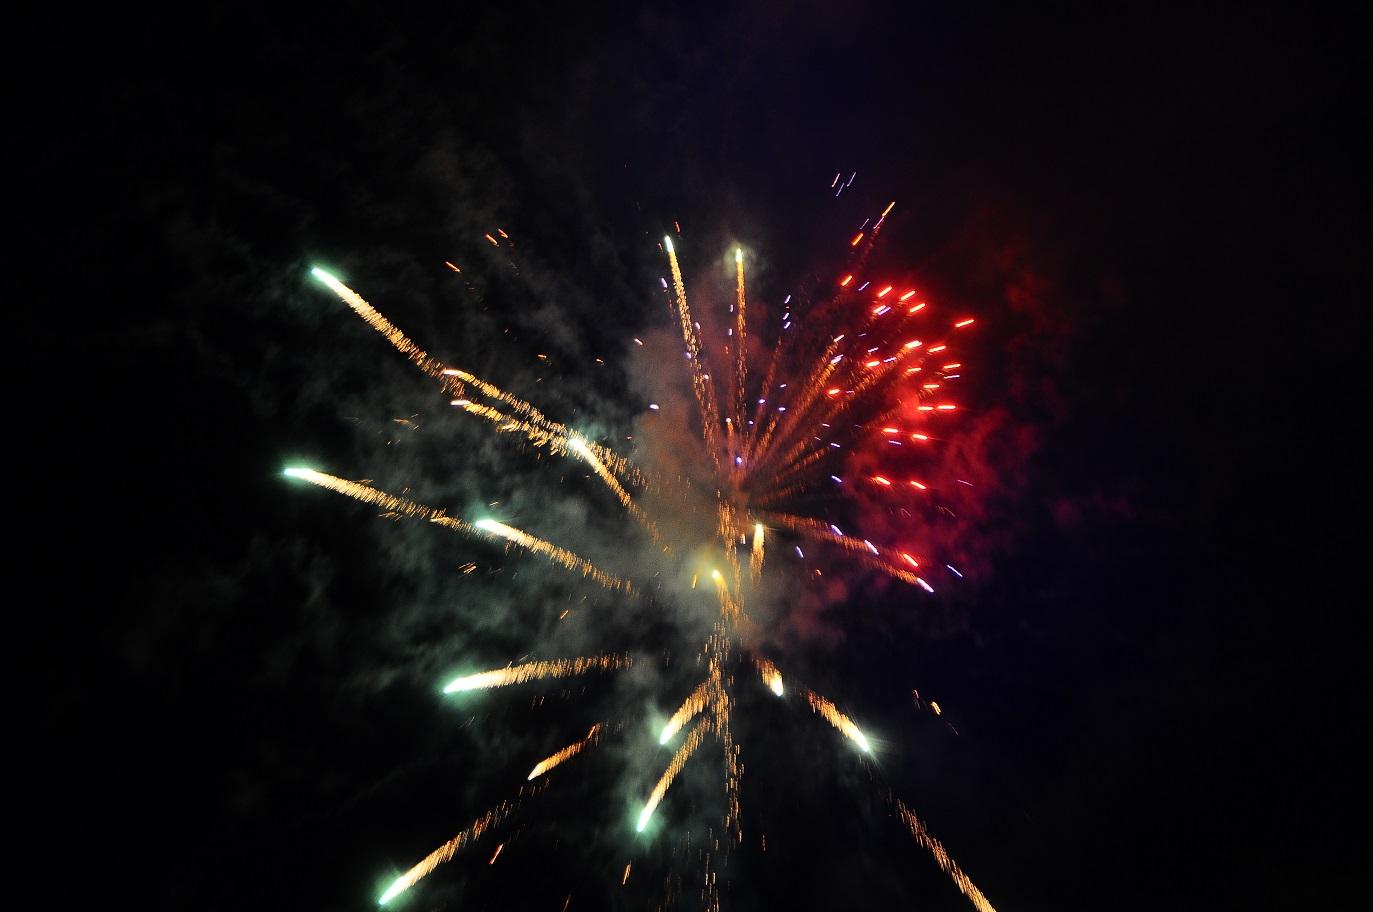 Fireworks 2014 - 4a